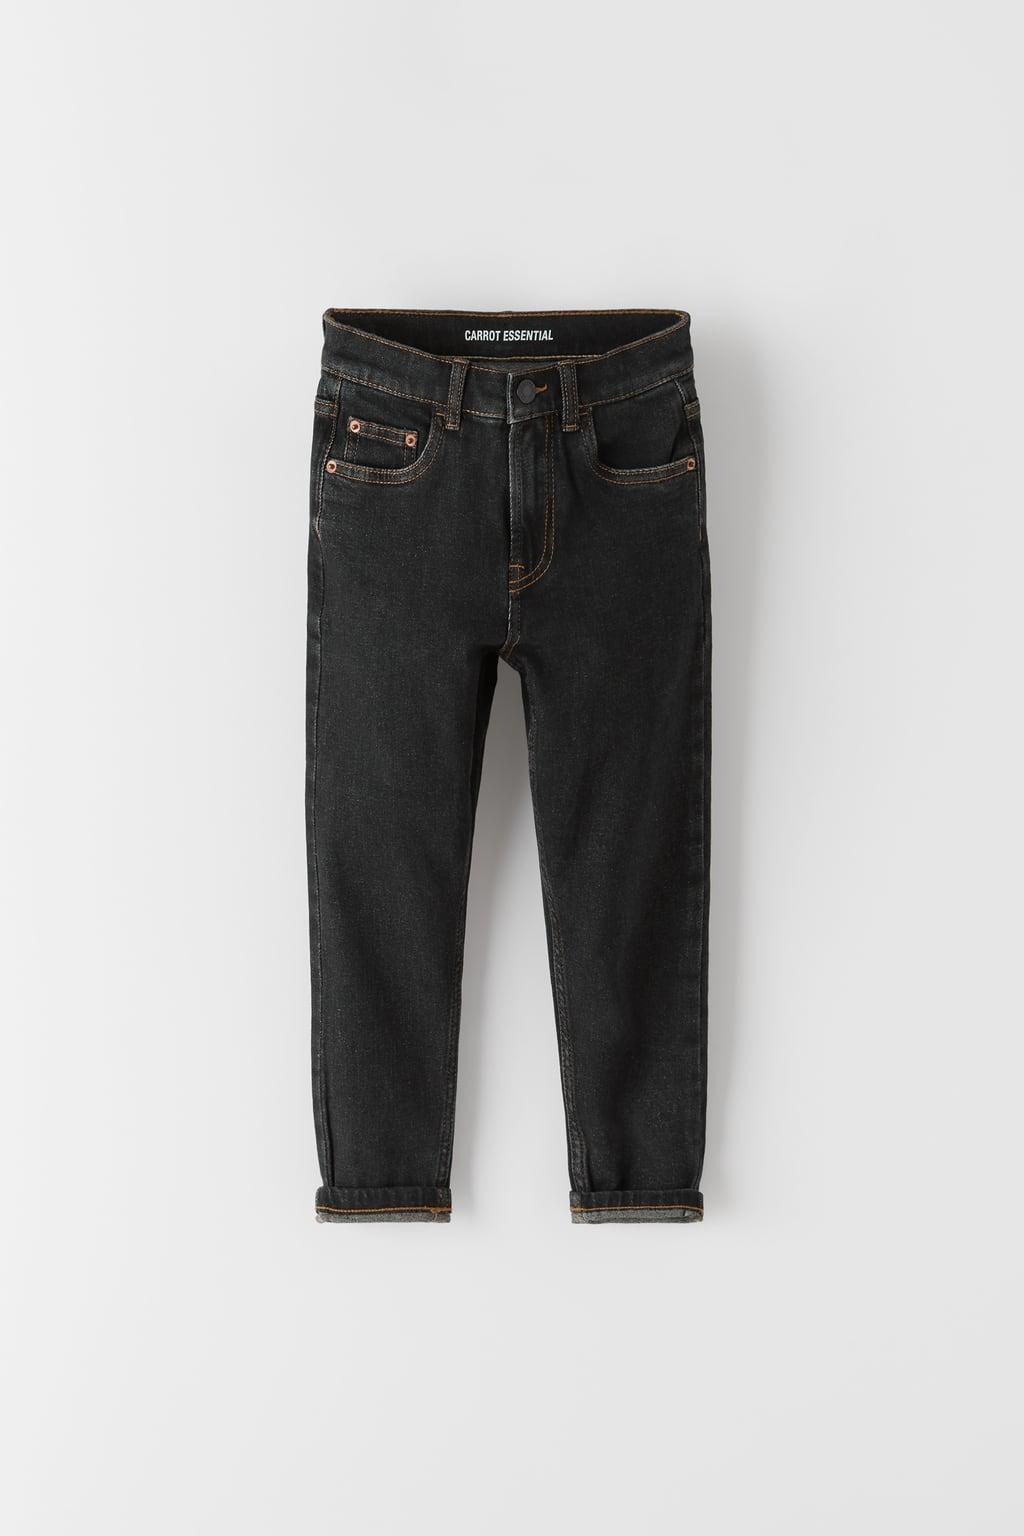 Отзыв на CARROT-FIT-JEANS – ESSENTIAL из Интернет-Магазина Zara